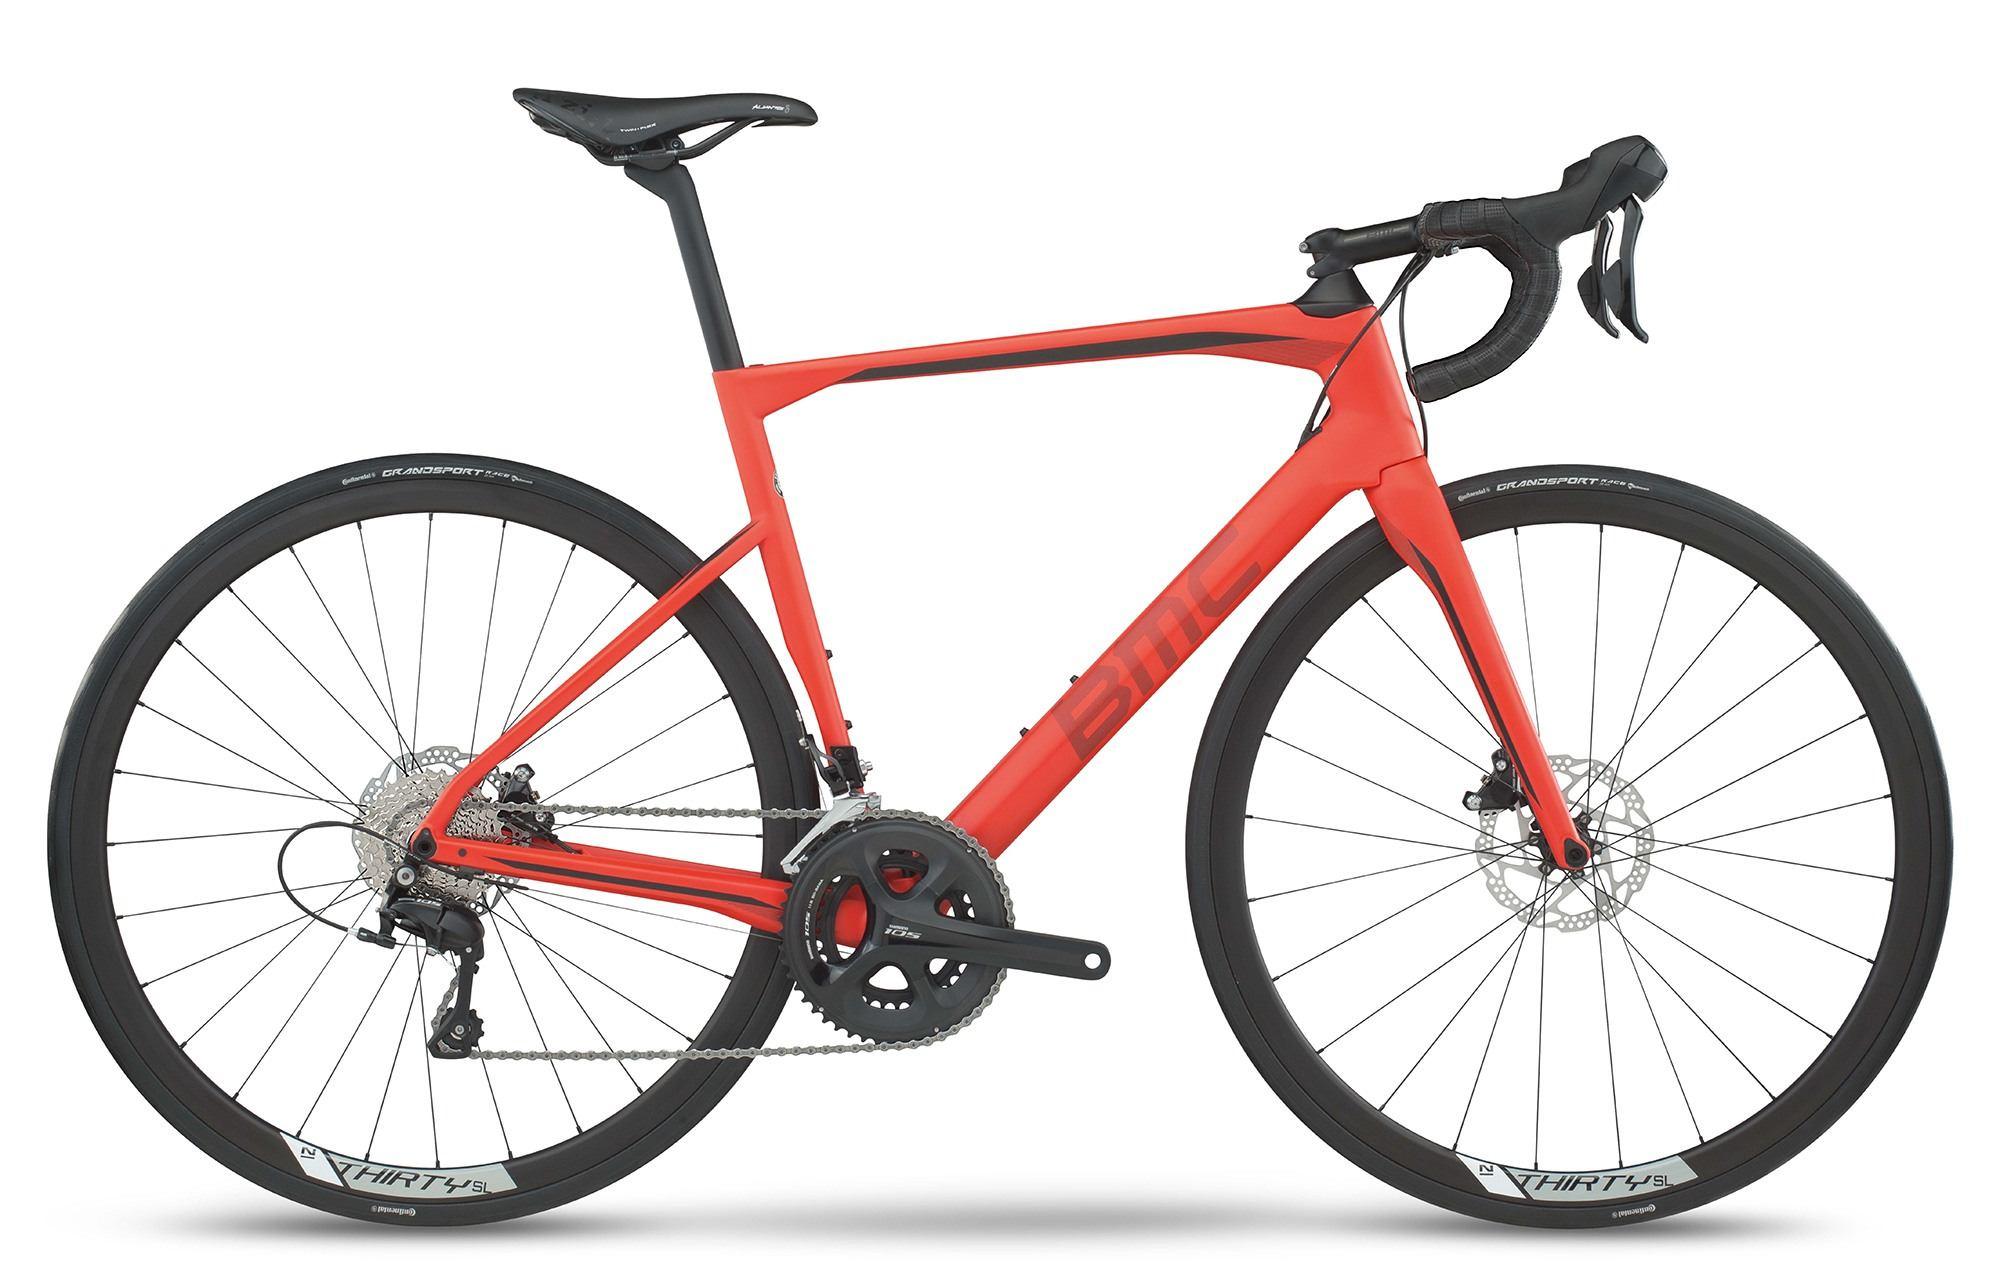 9807302617f 2017 BMC RoadMachine 02 105 Bike